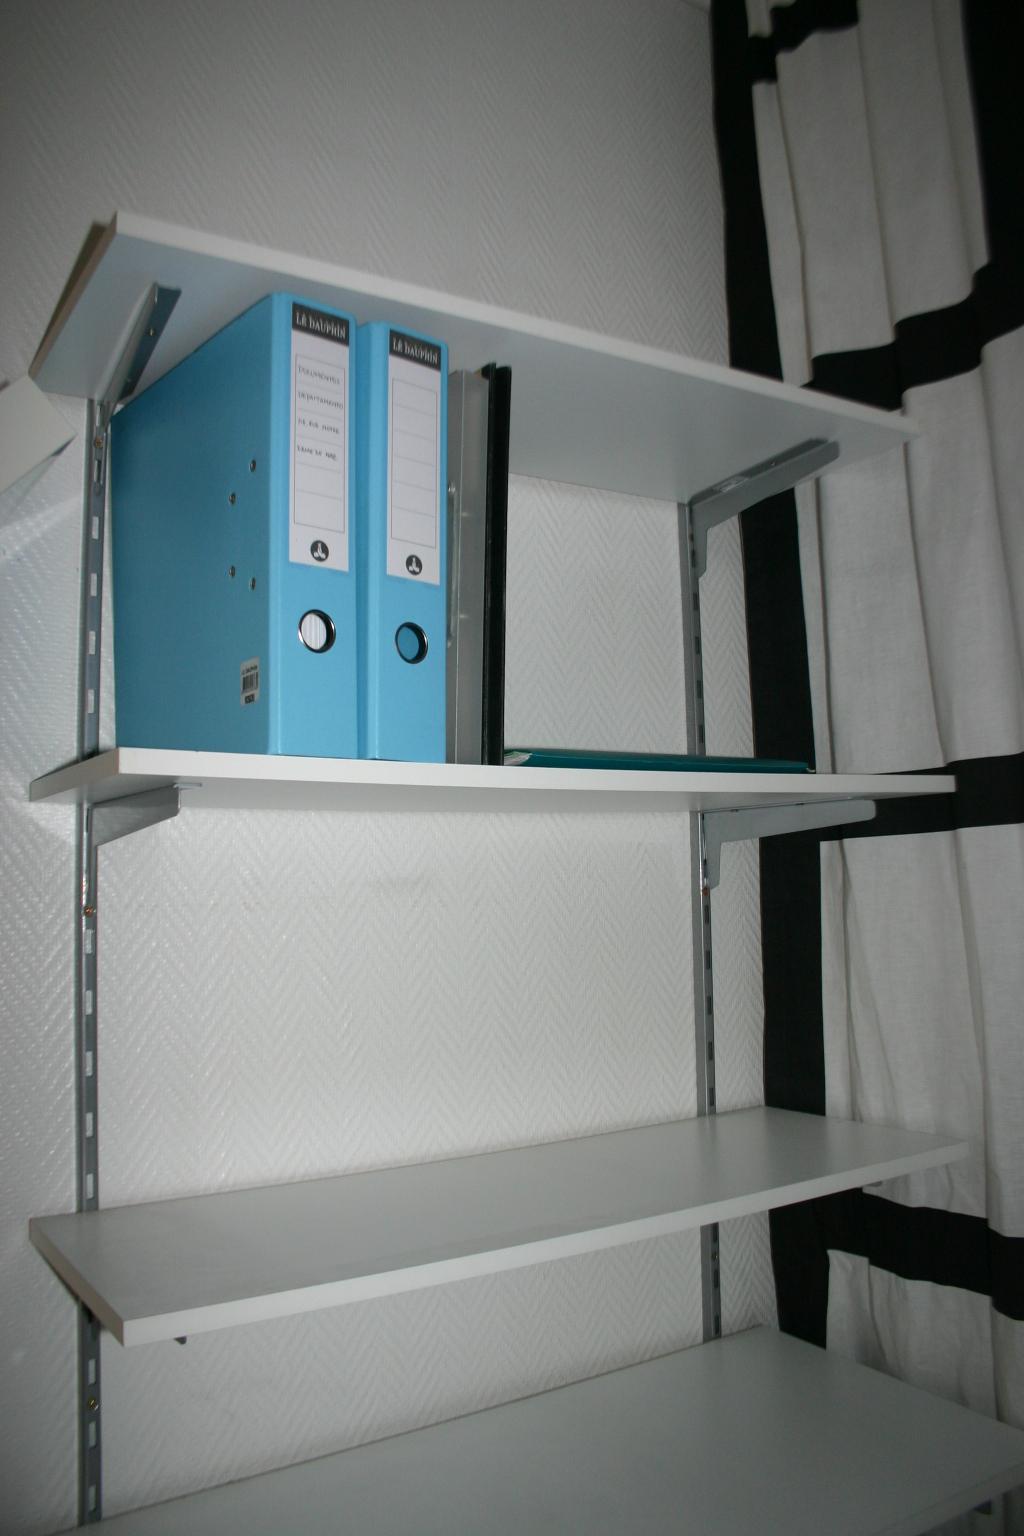 cremaillere etagere dedans la brocante du tagre antonius ikea with etagere cremaillere castorama. Black Bedroom Furniture Sets. Home Design Ideas